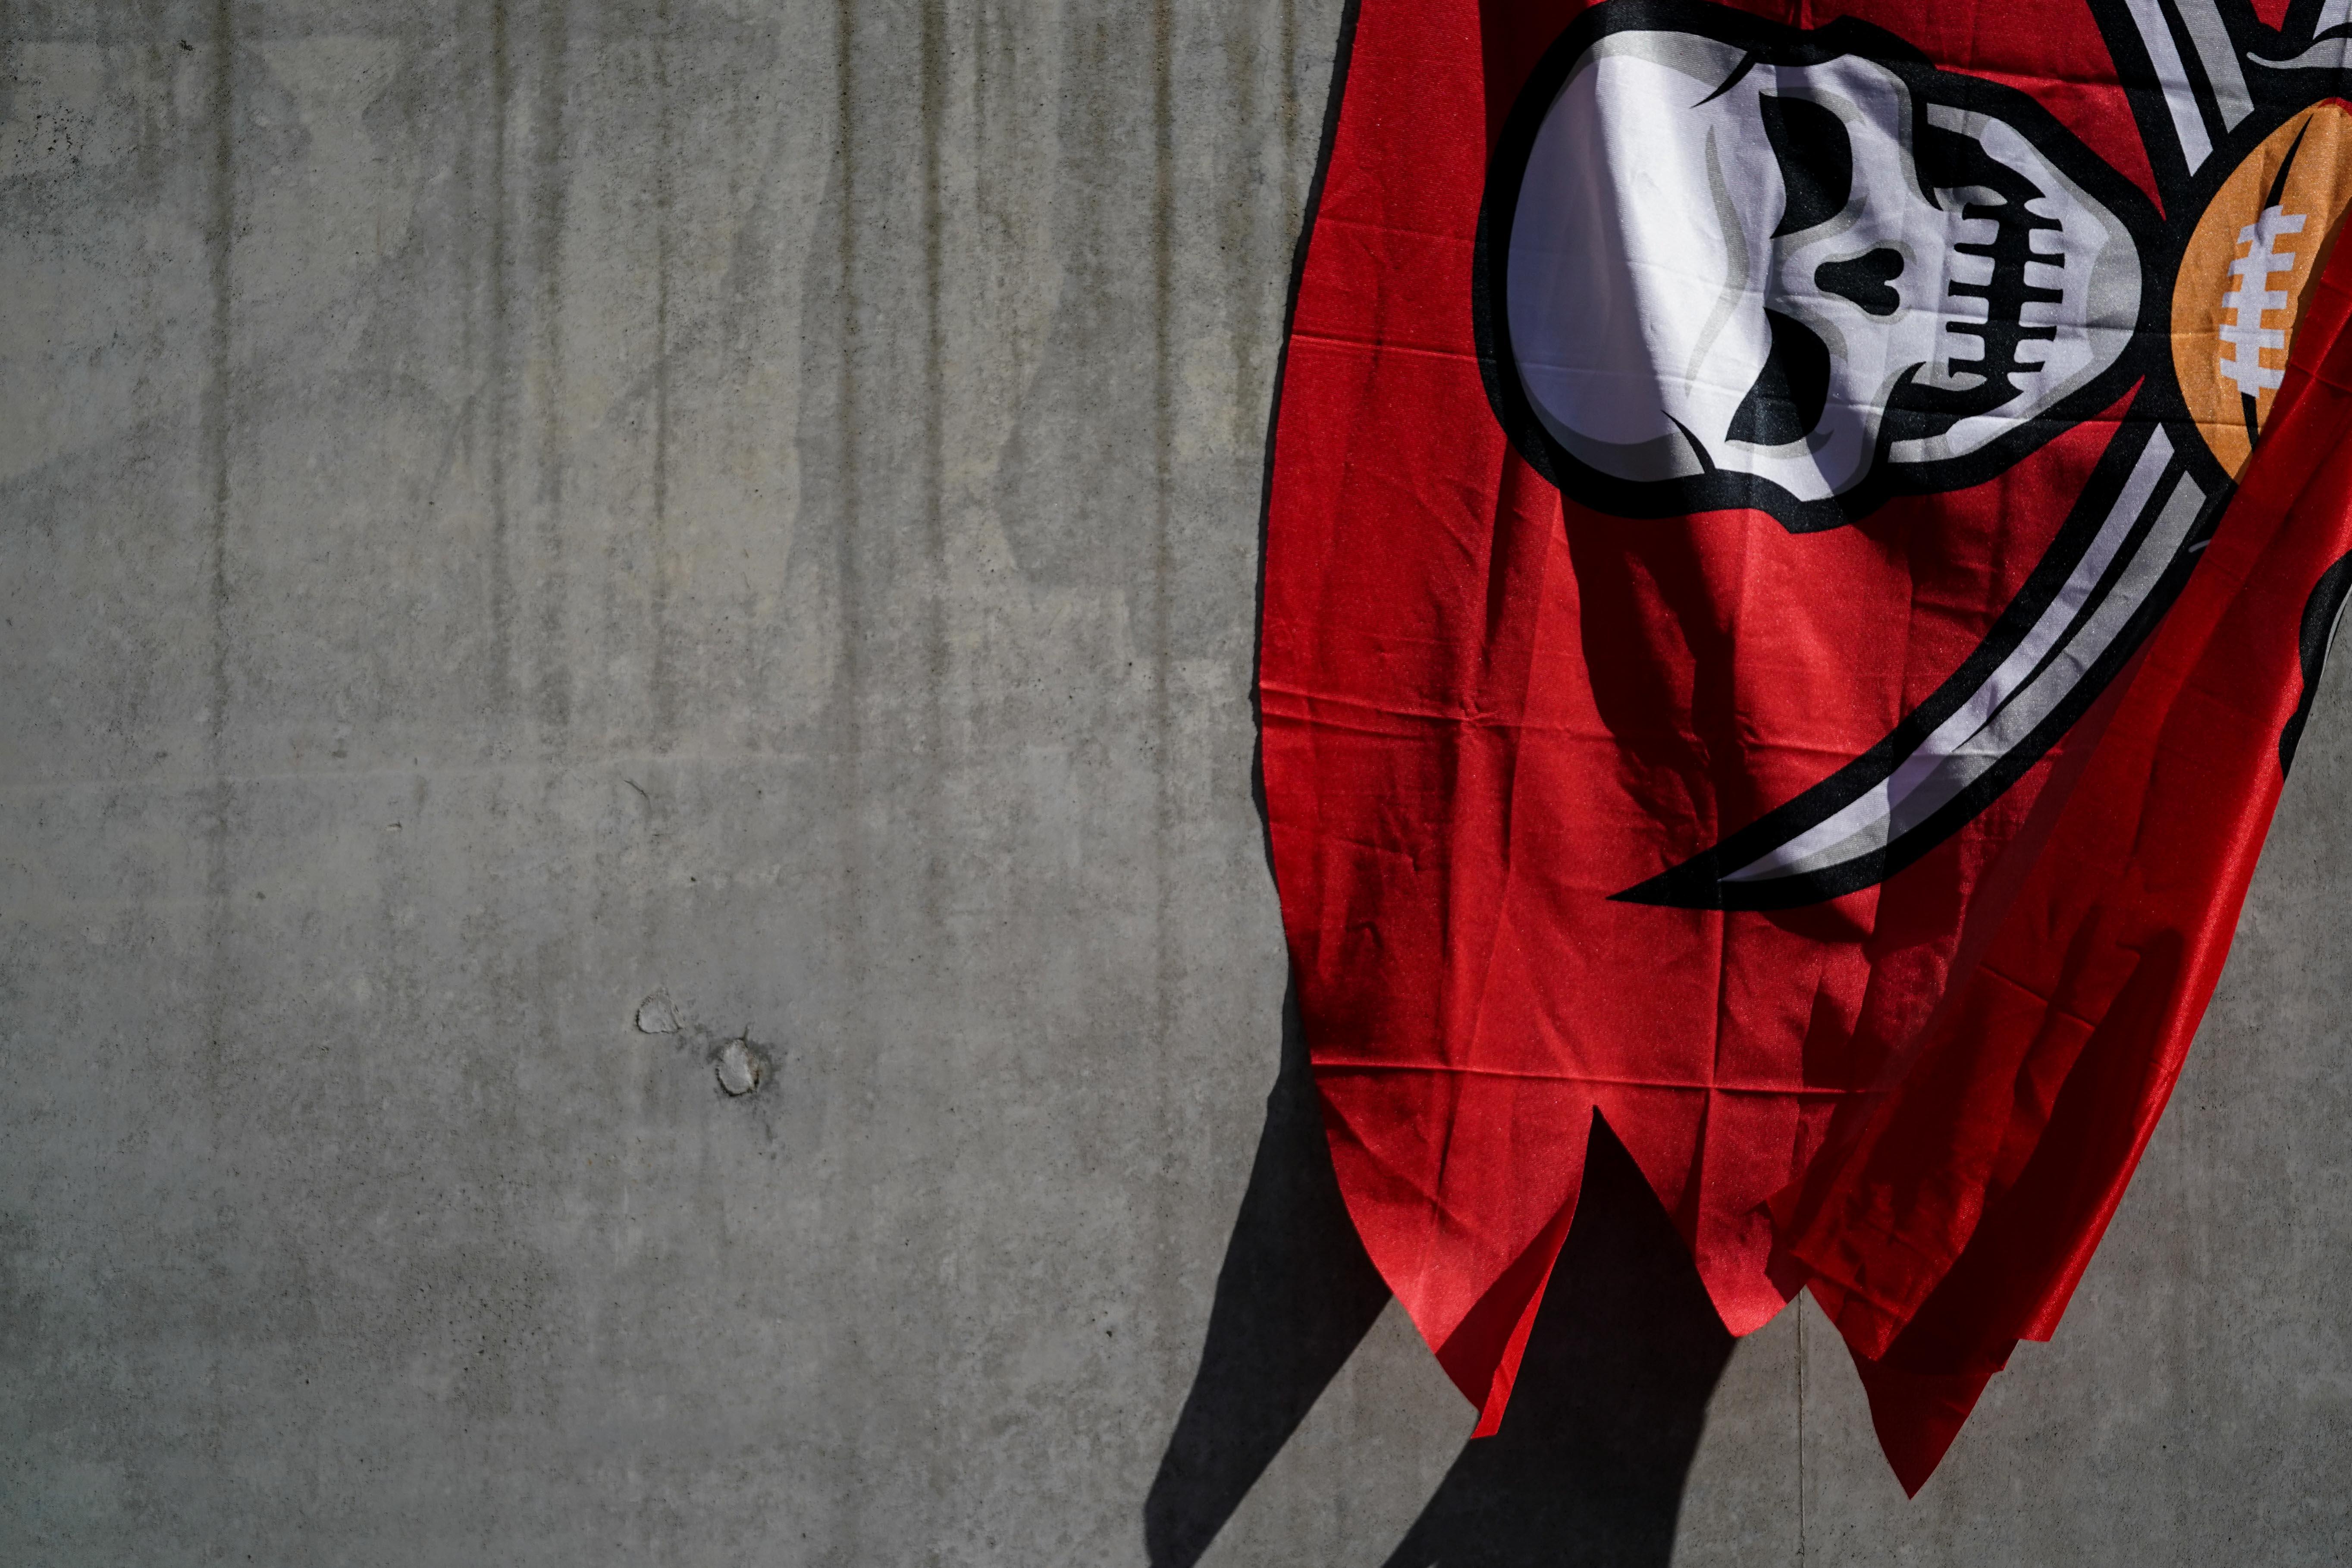 NFL: Tampa Bay Buccaneers at Cincinnati Bengals